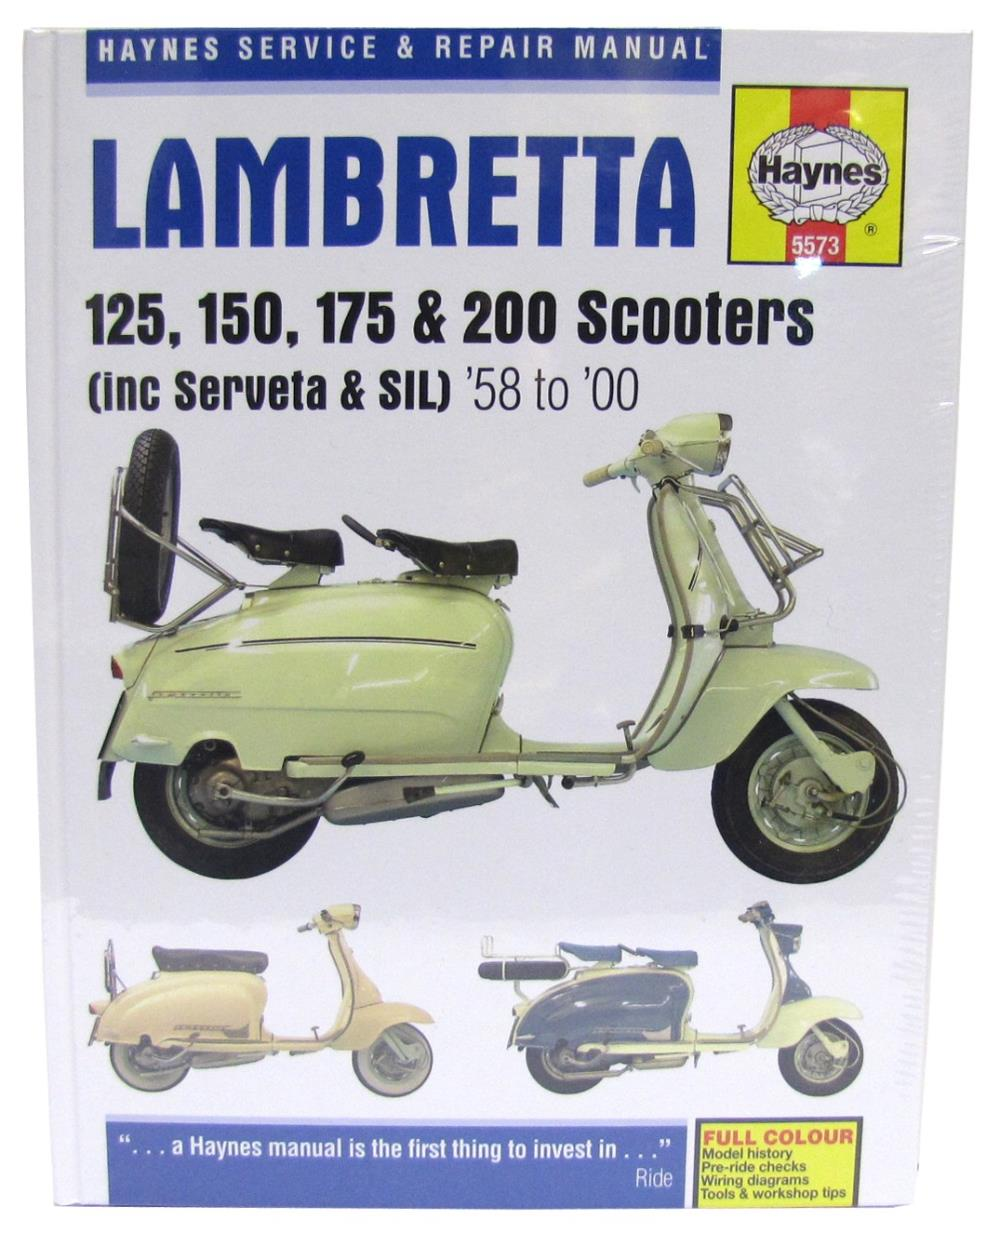 Image is loading Manual-Haynes-for-1961-Lambretta-LI-125-Series-